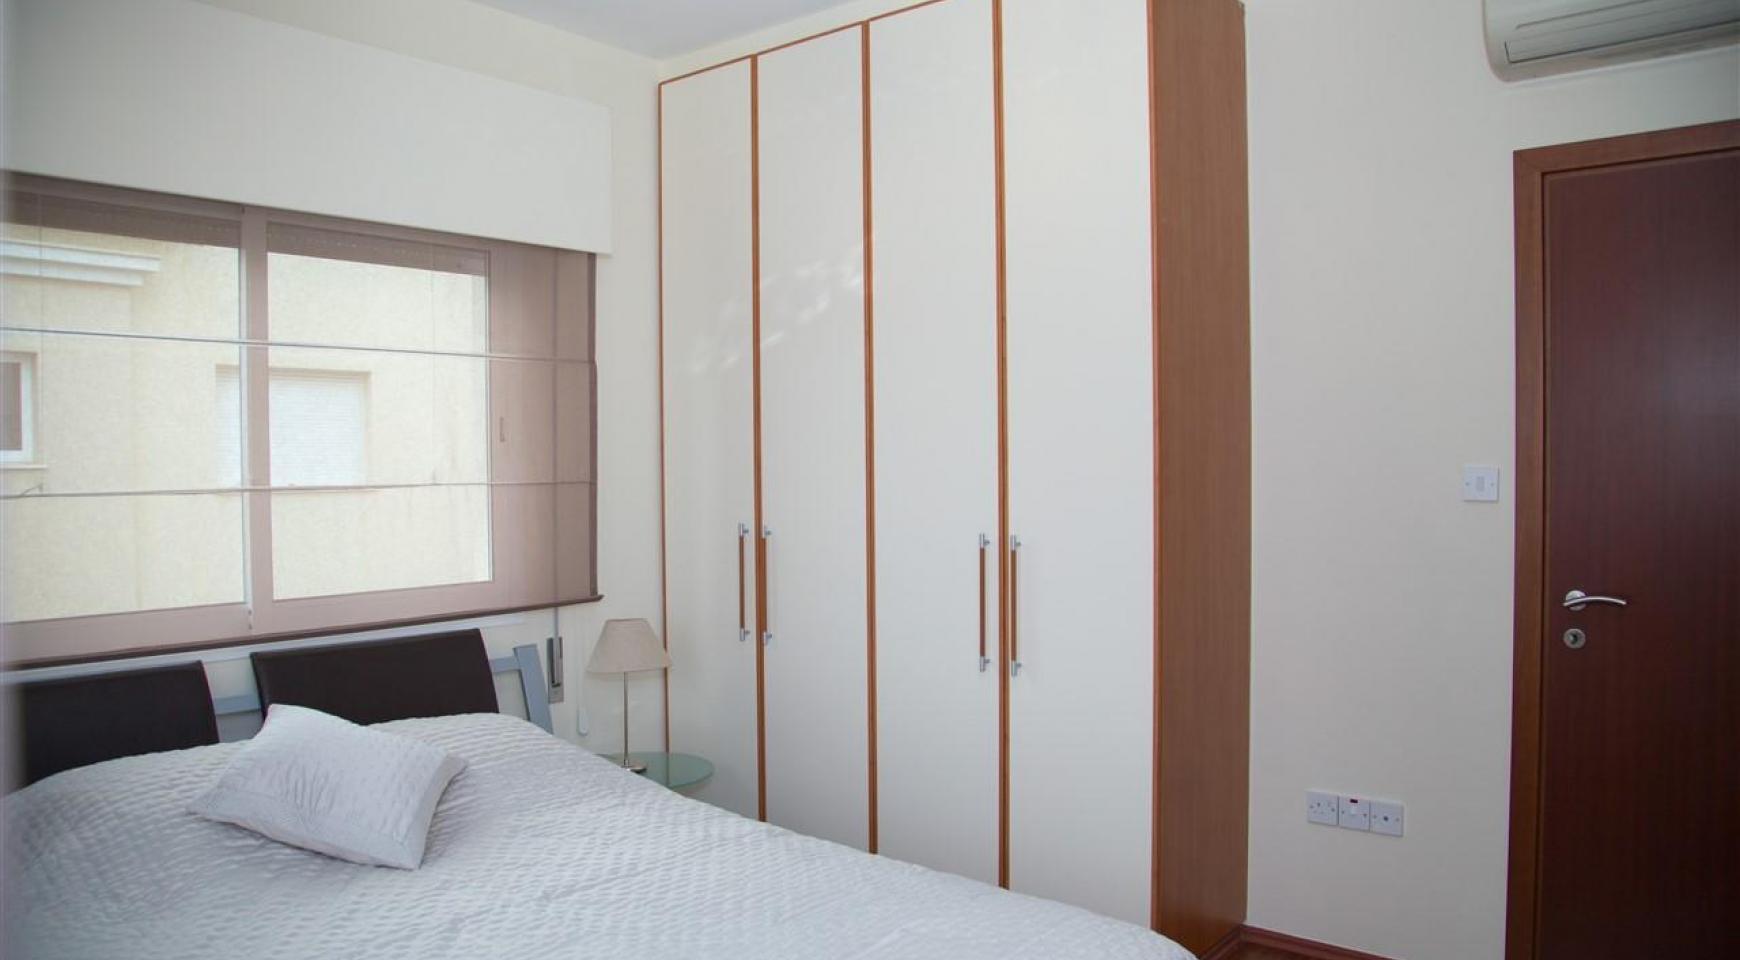 2 Bedroom Apartment Mesogios Iris 304 in the Complex near the Sea - 14